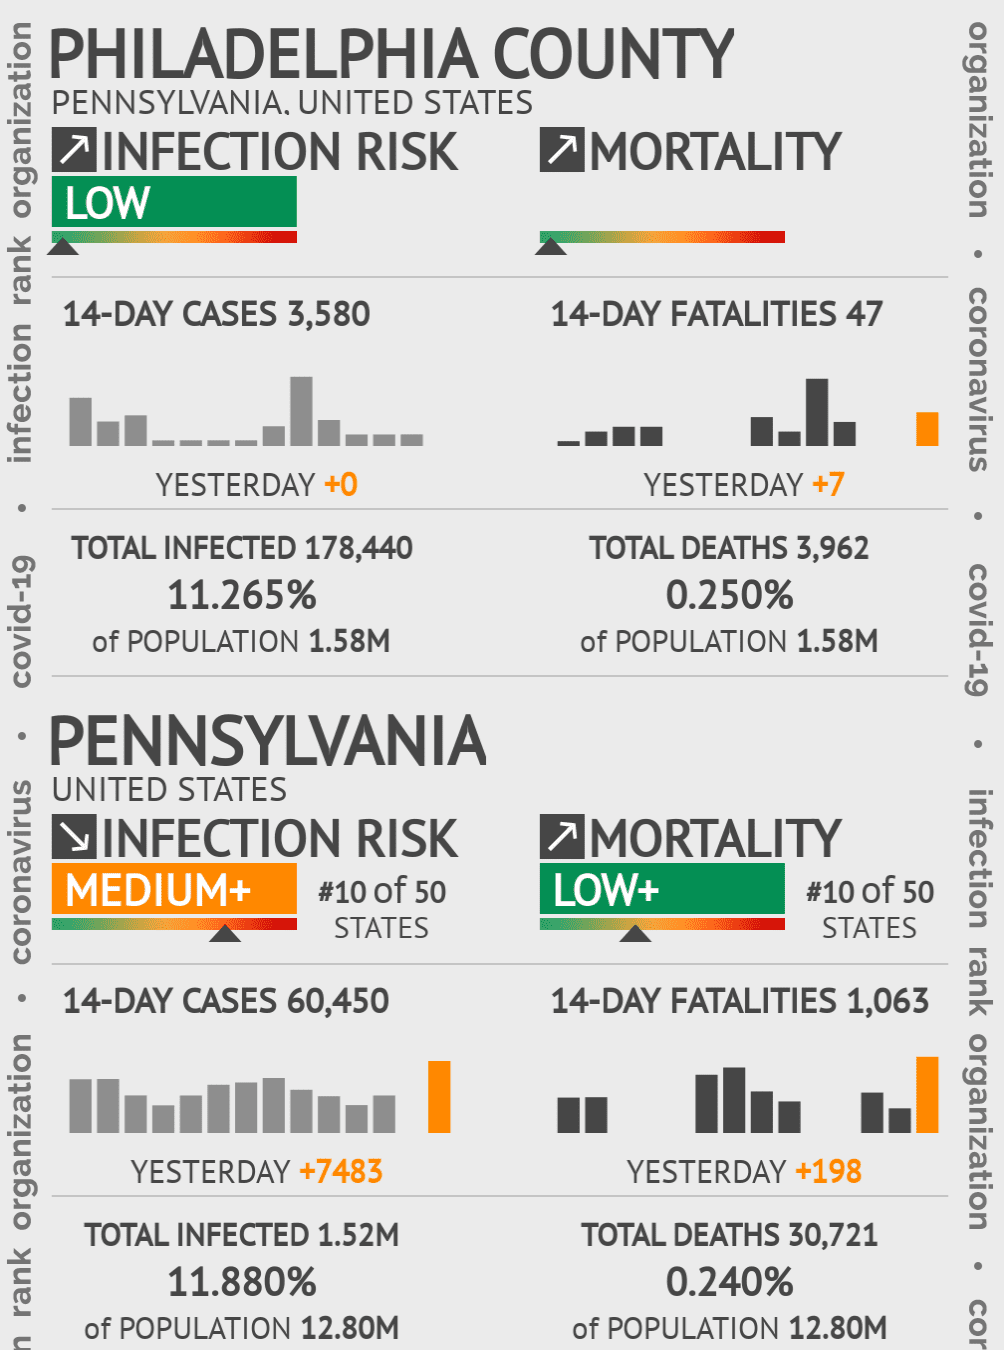 Philadelphia County Coronavirus Covid-19 Risk of Infection on July 24, 2021